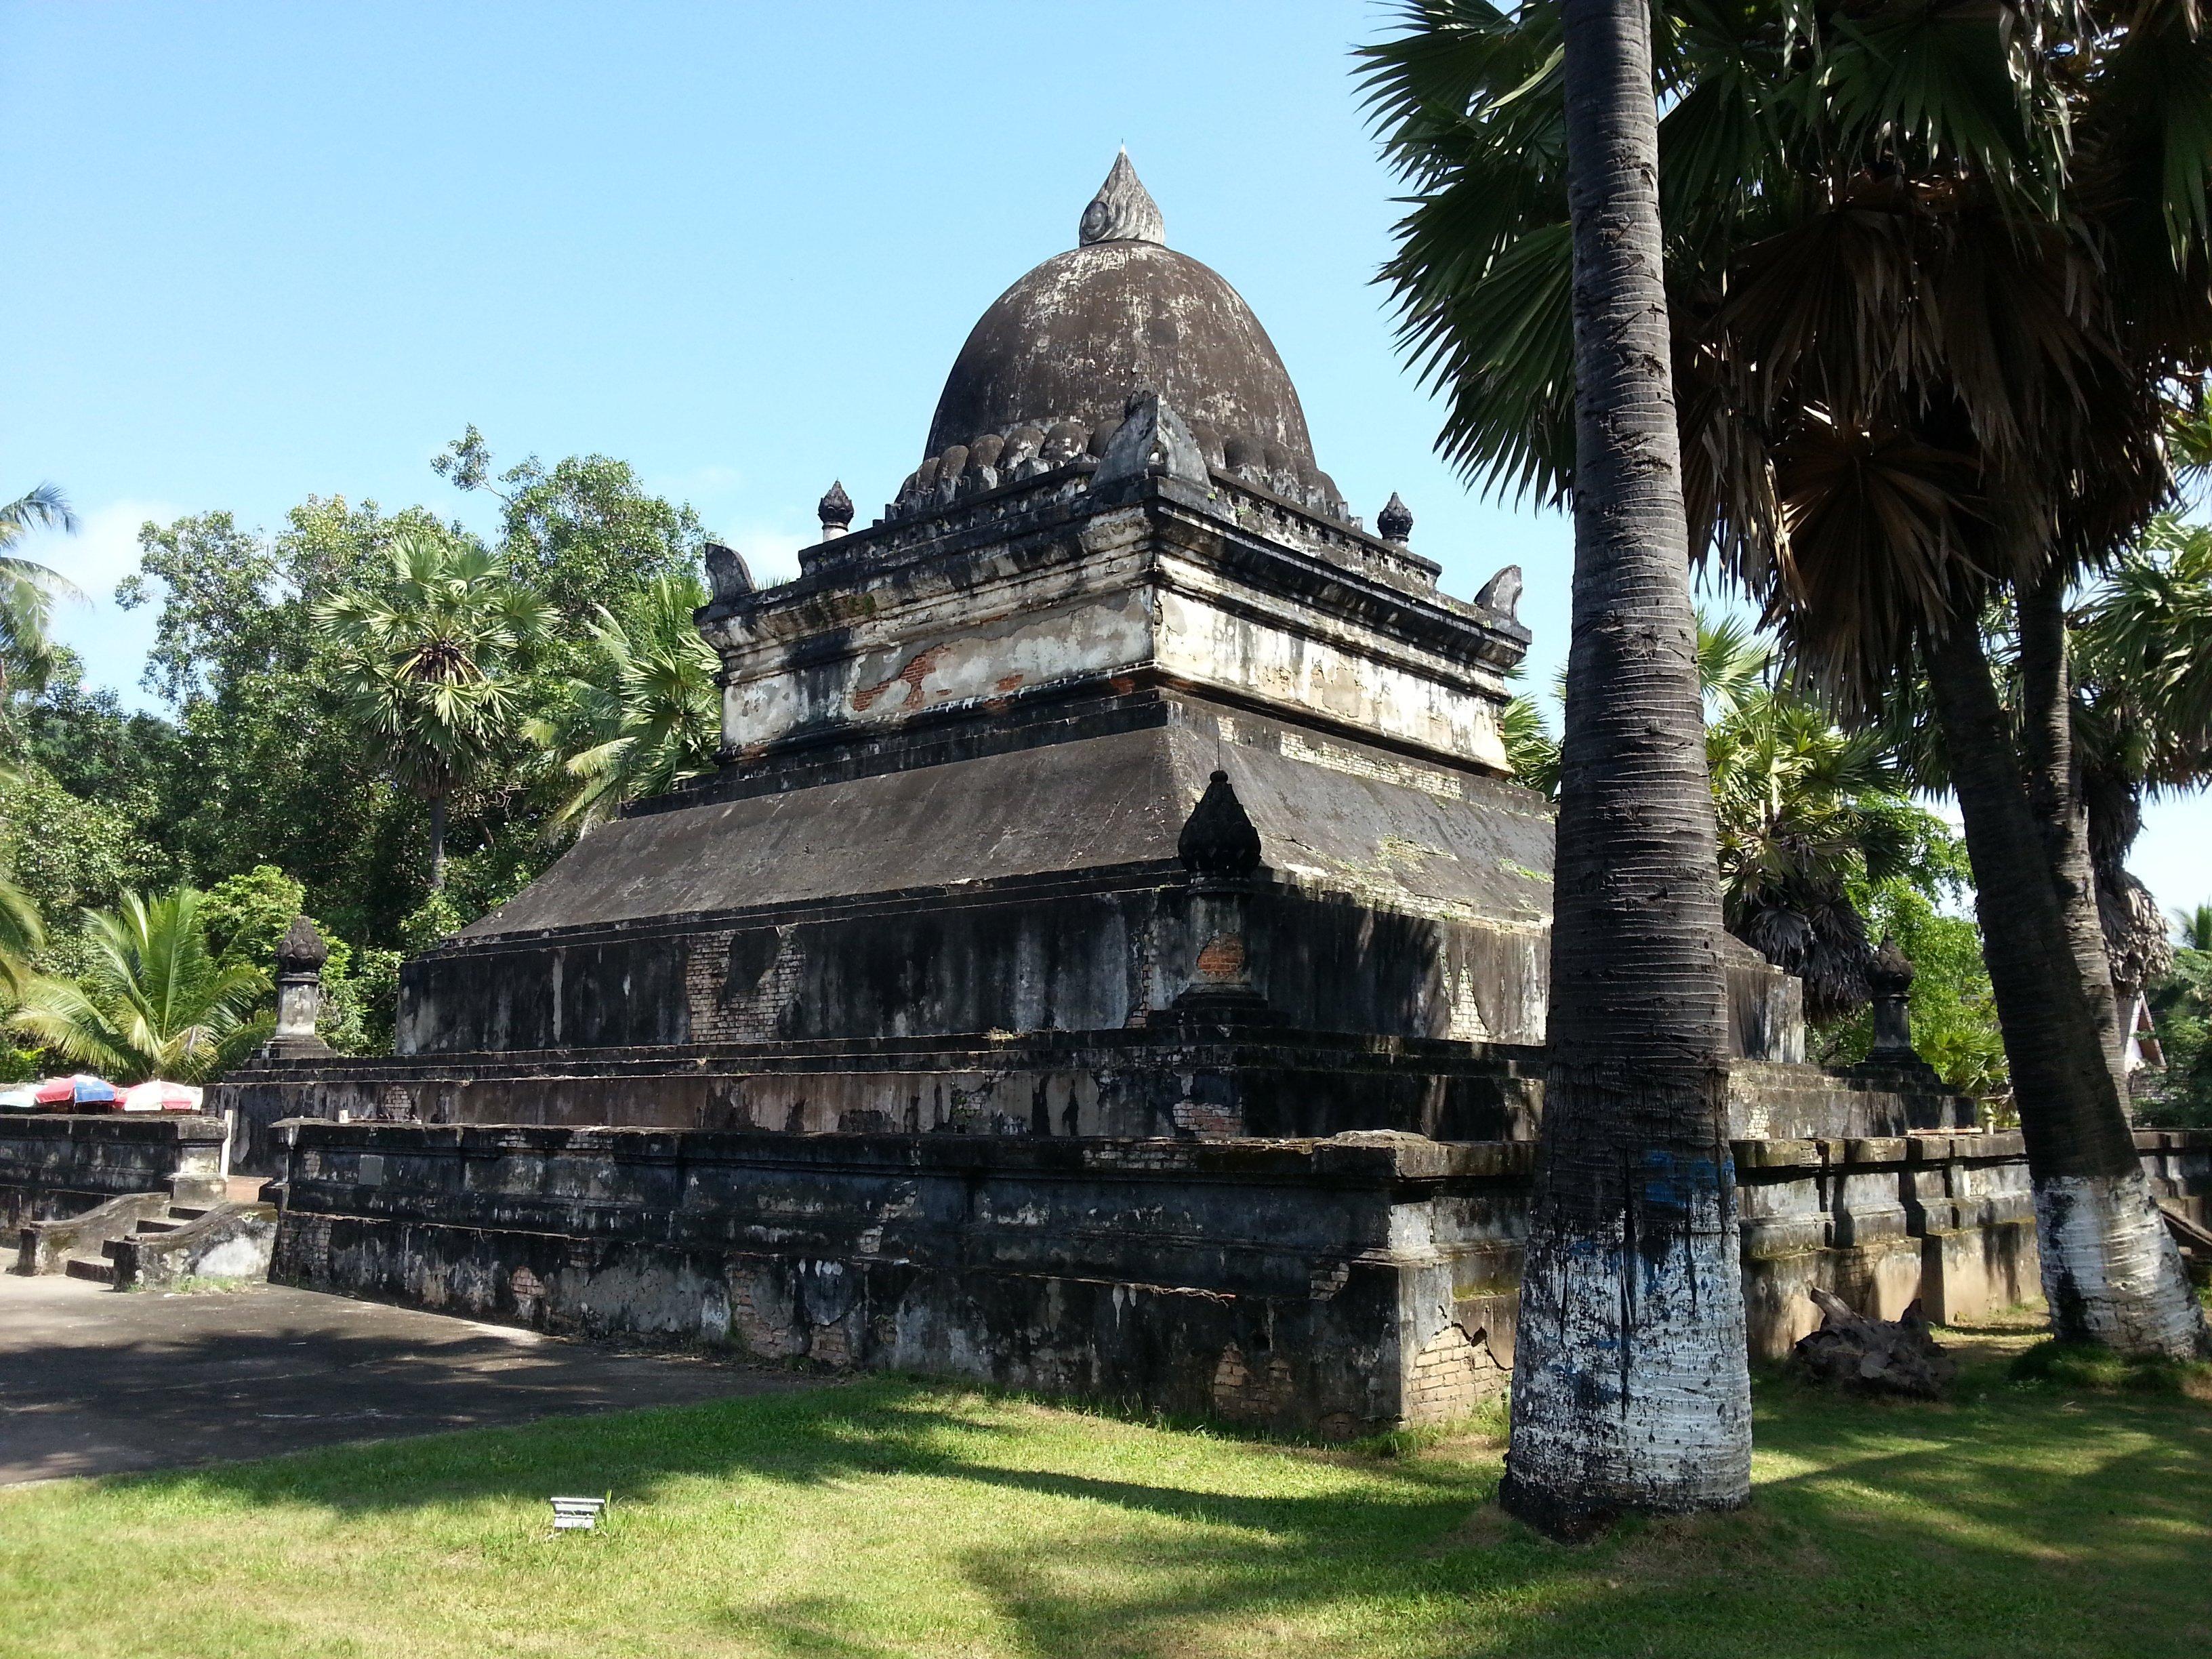 That Makmo - the watermelon stupa